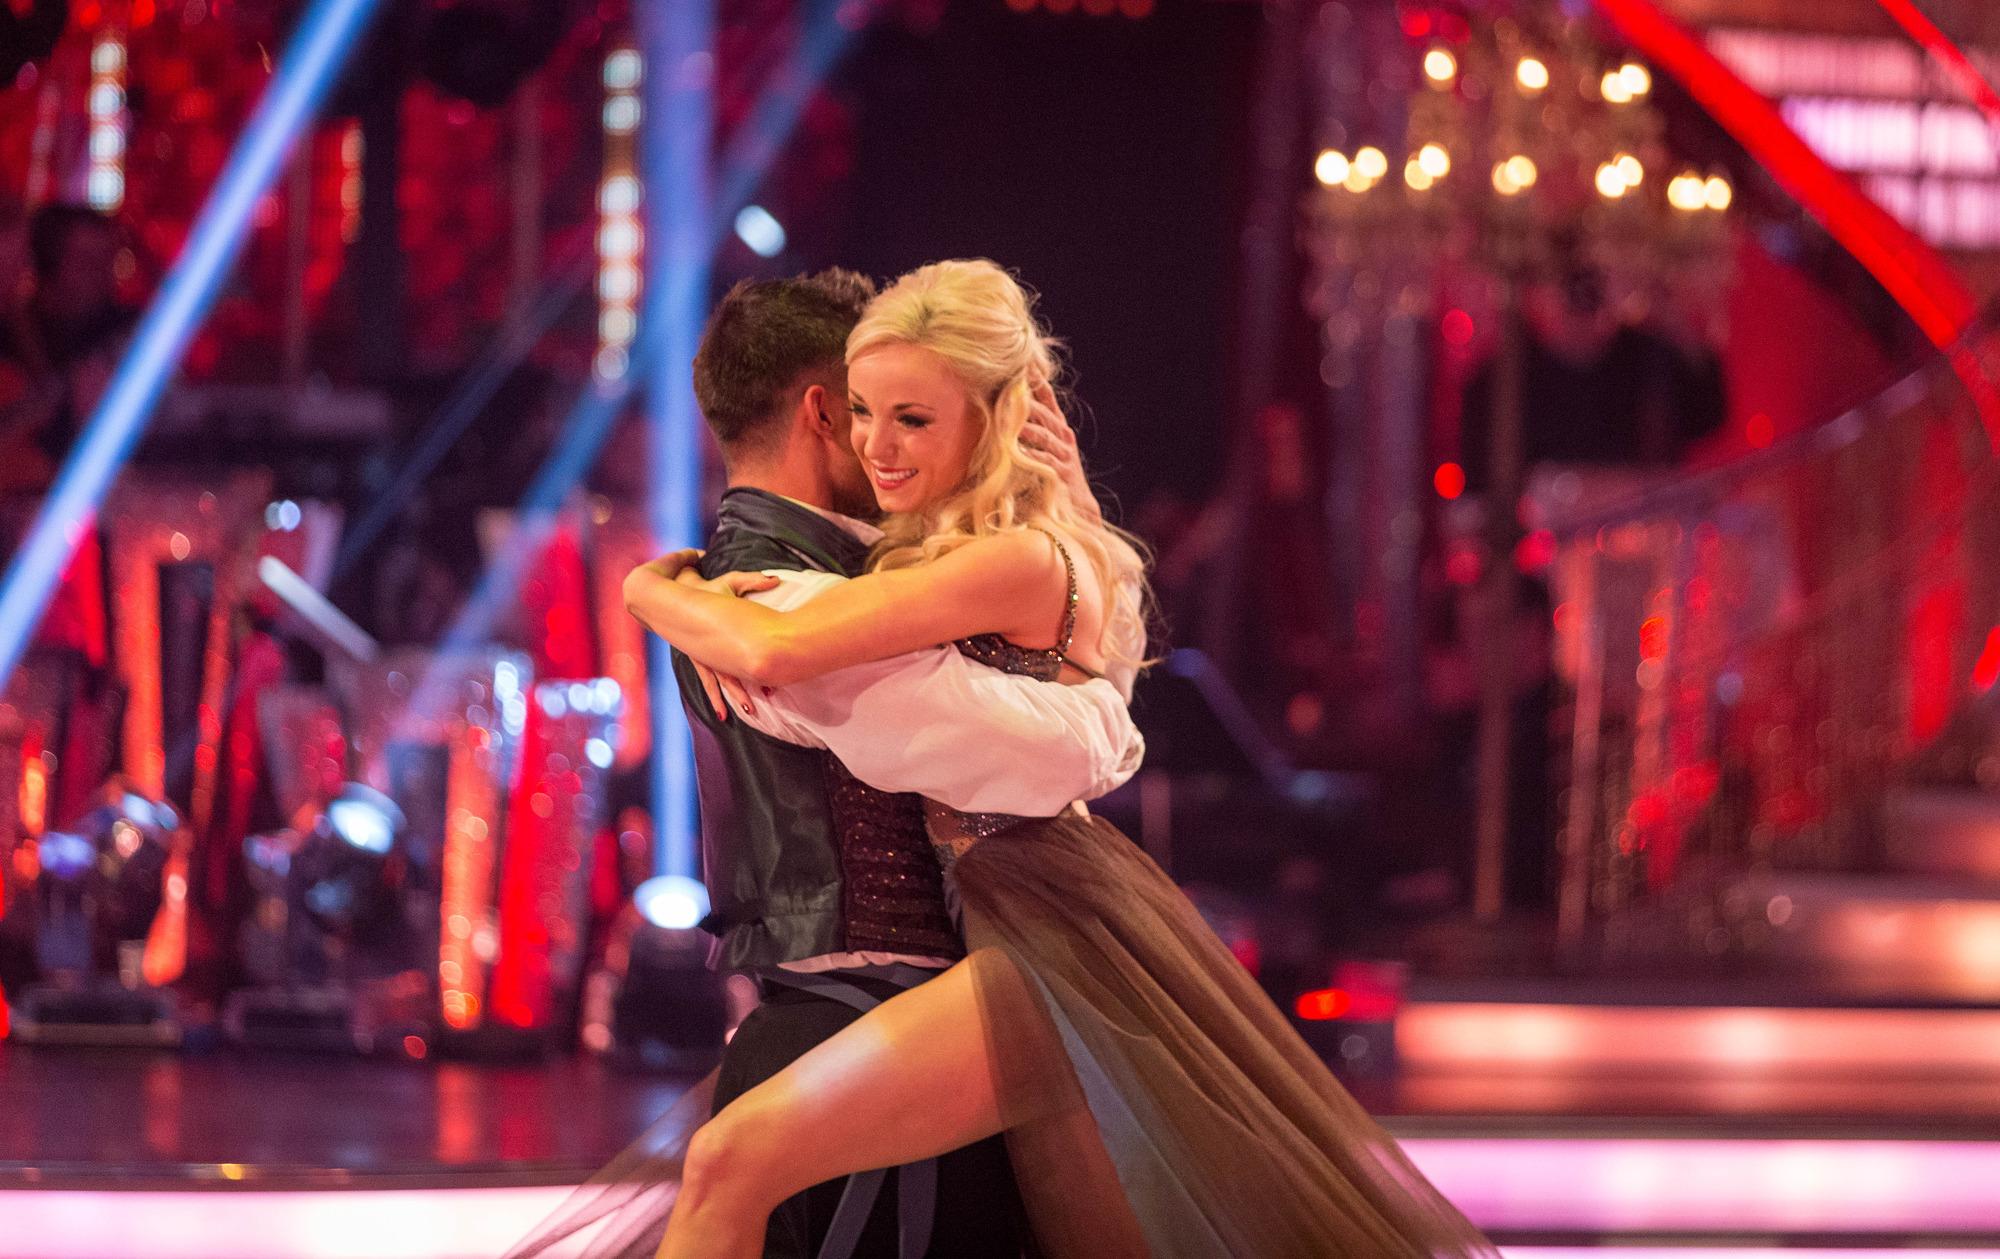 Helen and Aljaz take their final dance